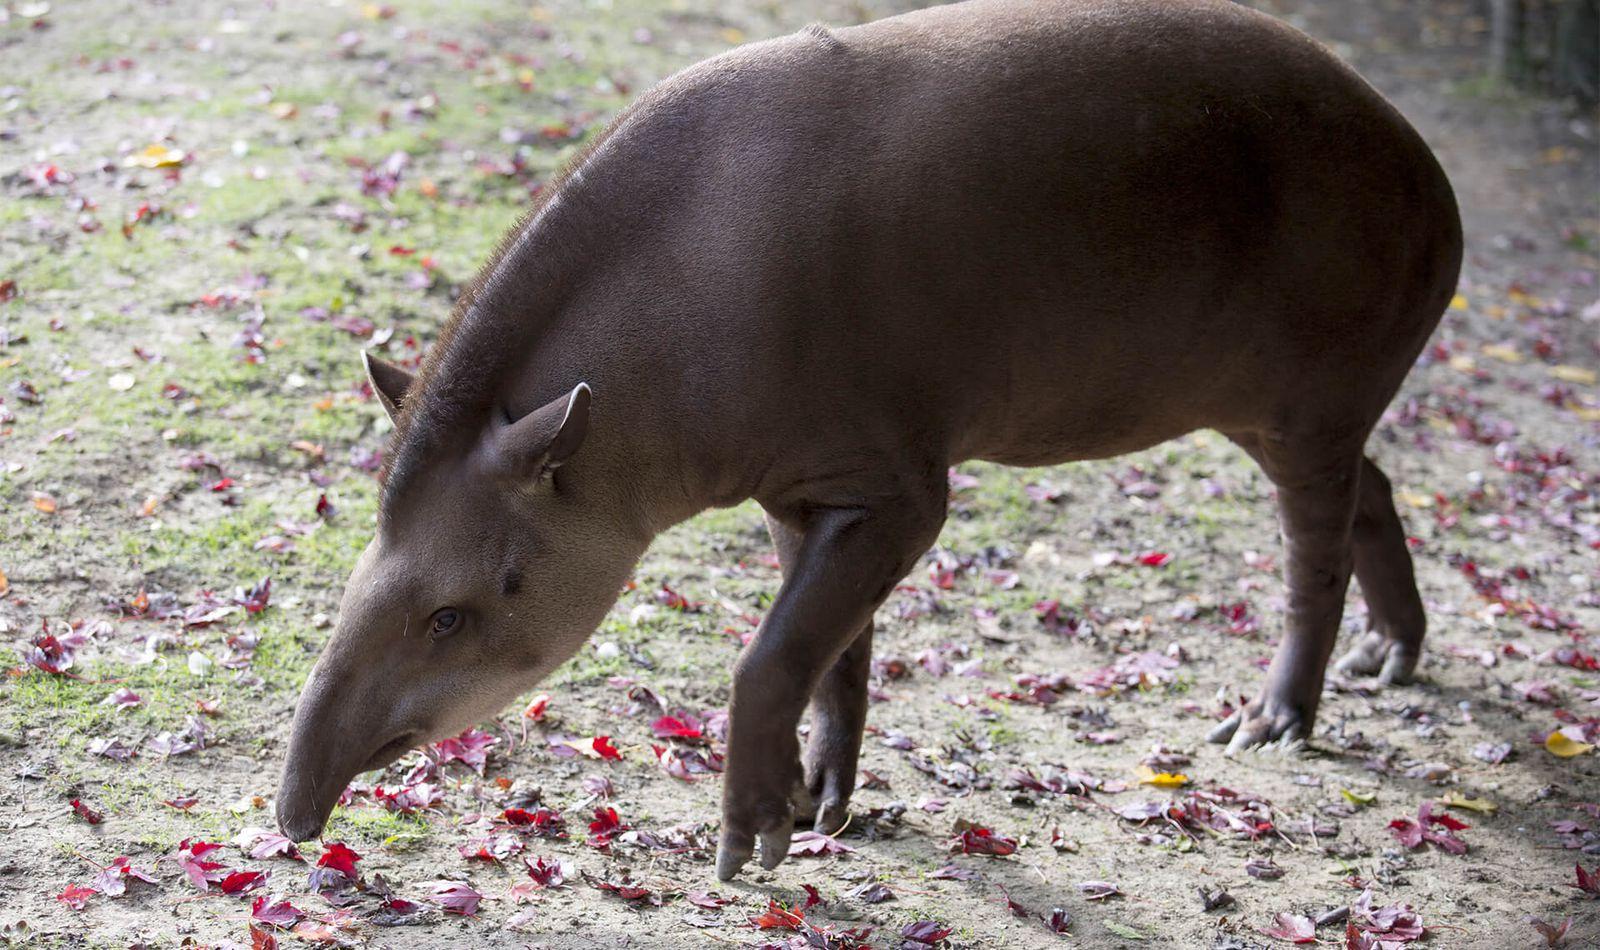 Tapir terrestre - Animaux extraordinaires du ZooParc